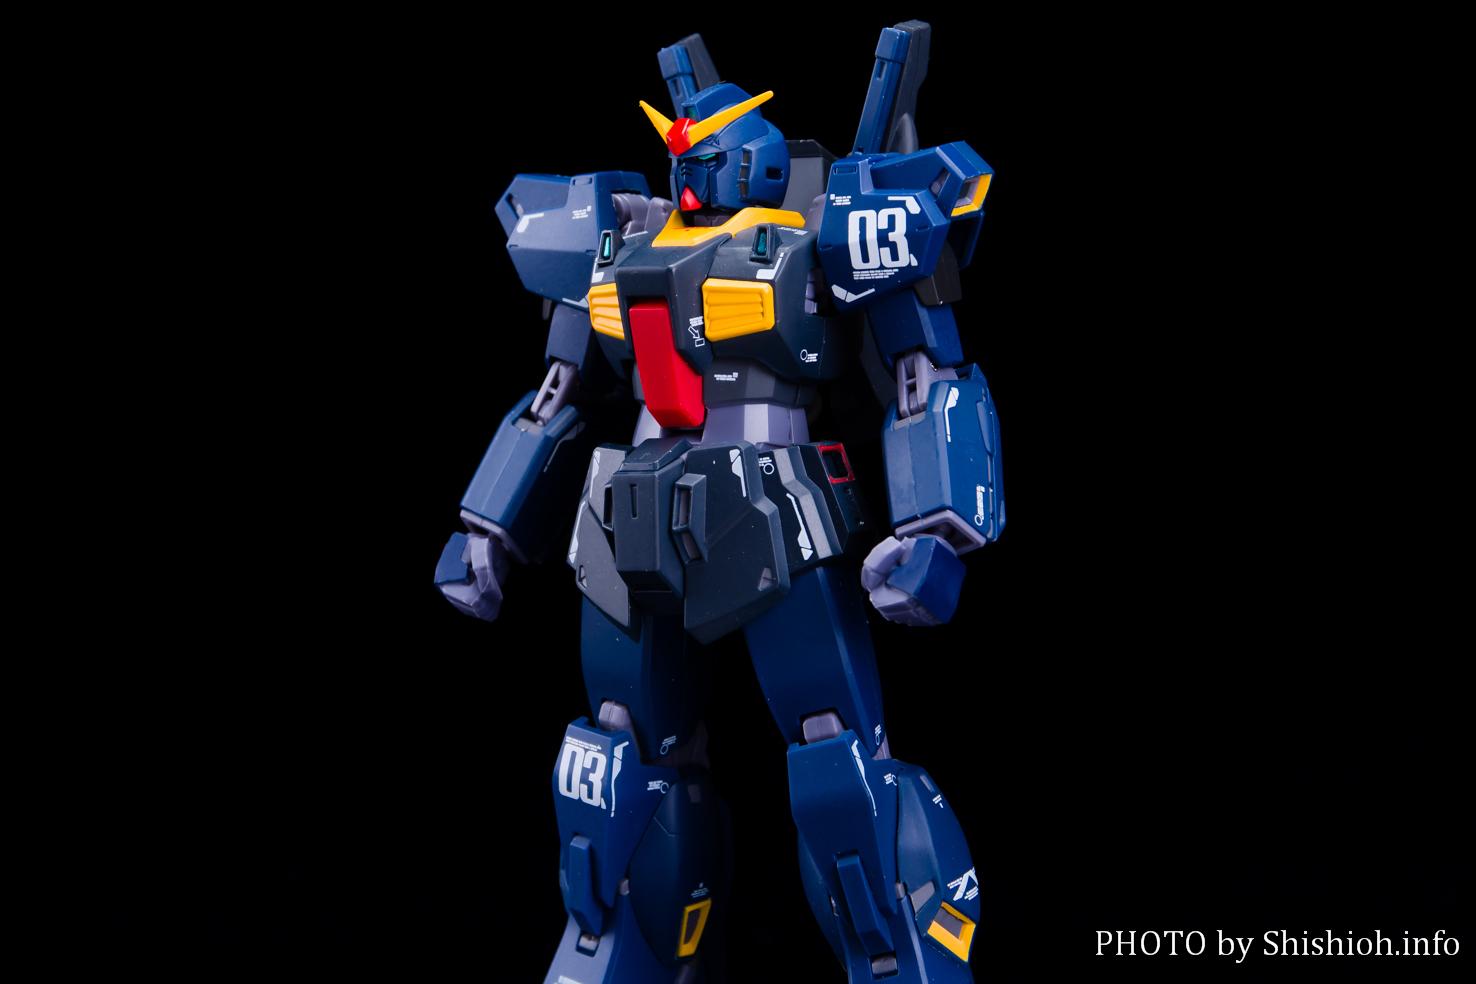 ROBOT魂 (Ka signature) 〈SIDE MS〉 ガンダムMk-II ティターンズ仕様